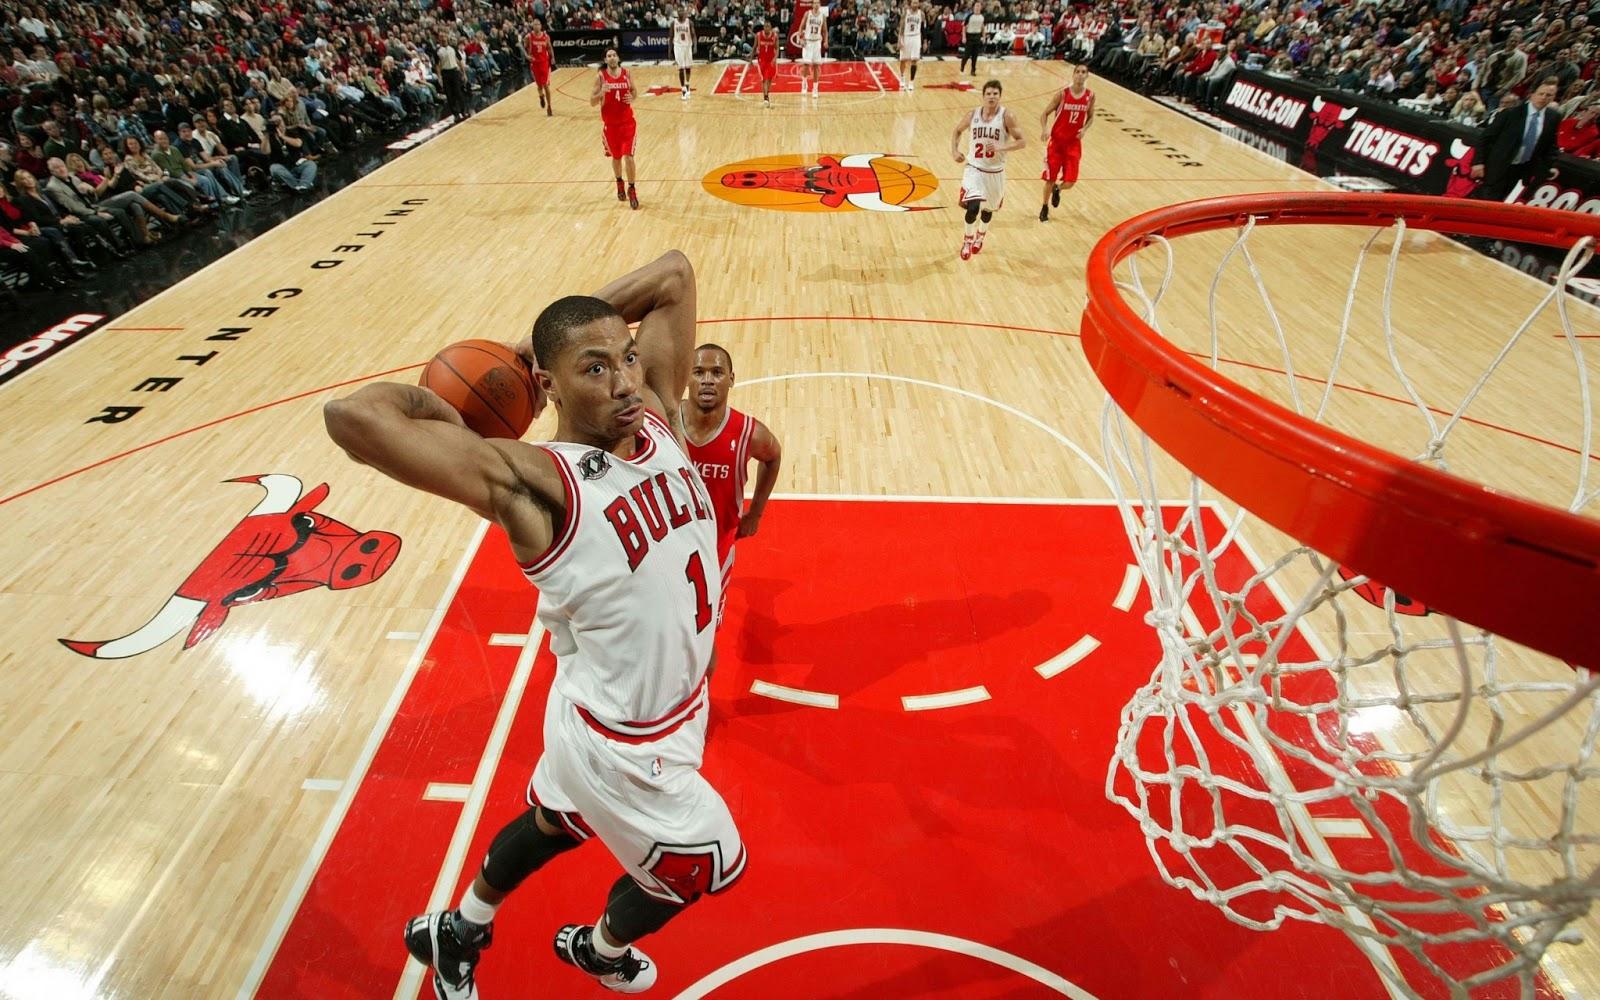 Basketball: HD Wallpaper: Basketball Hd Wallpapers